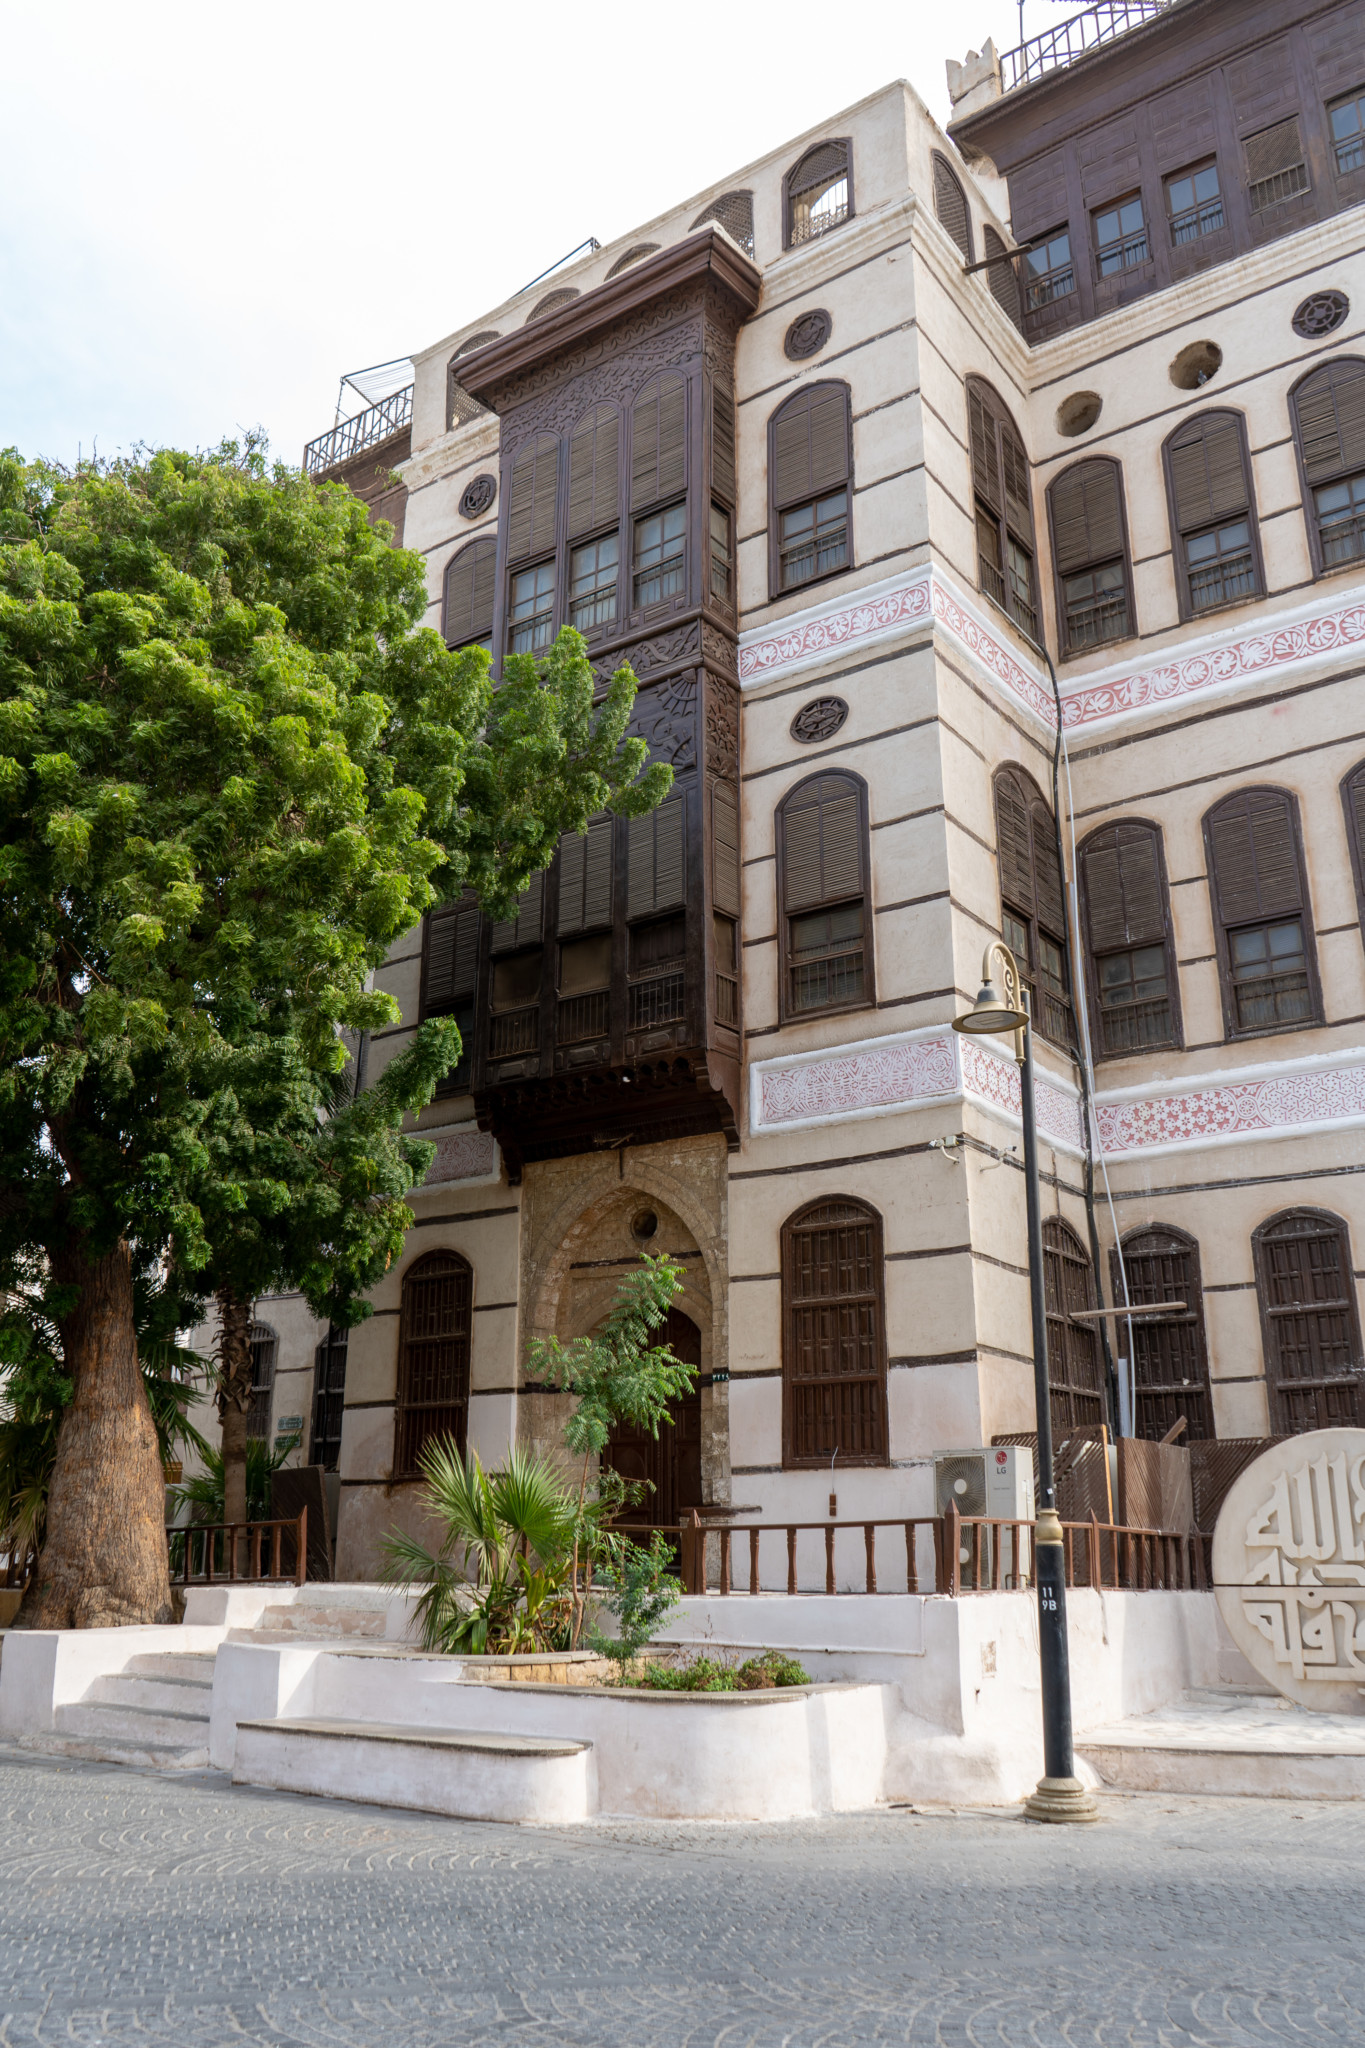 Museumshaus in Jeddah Saudi-Arabien